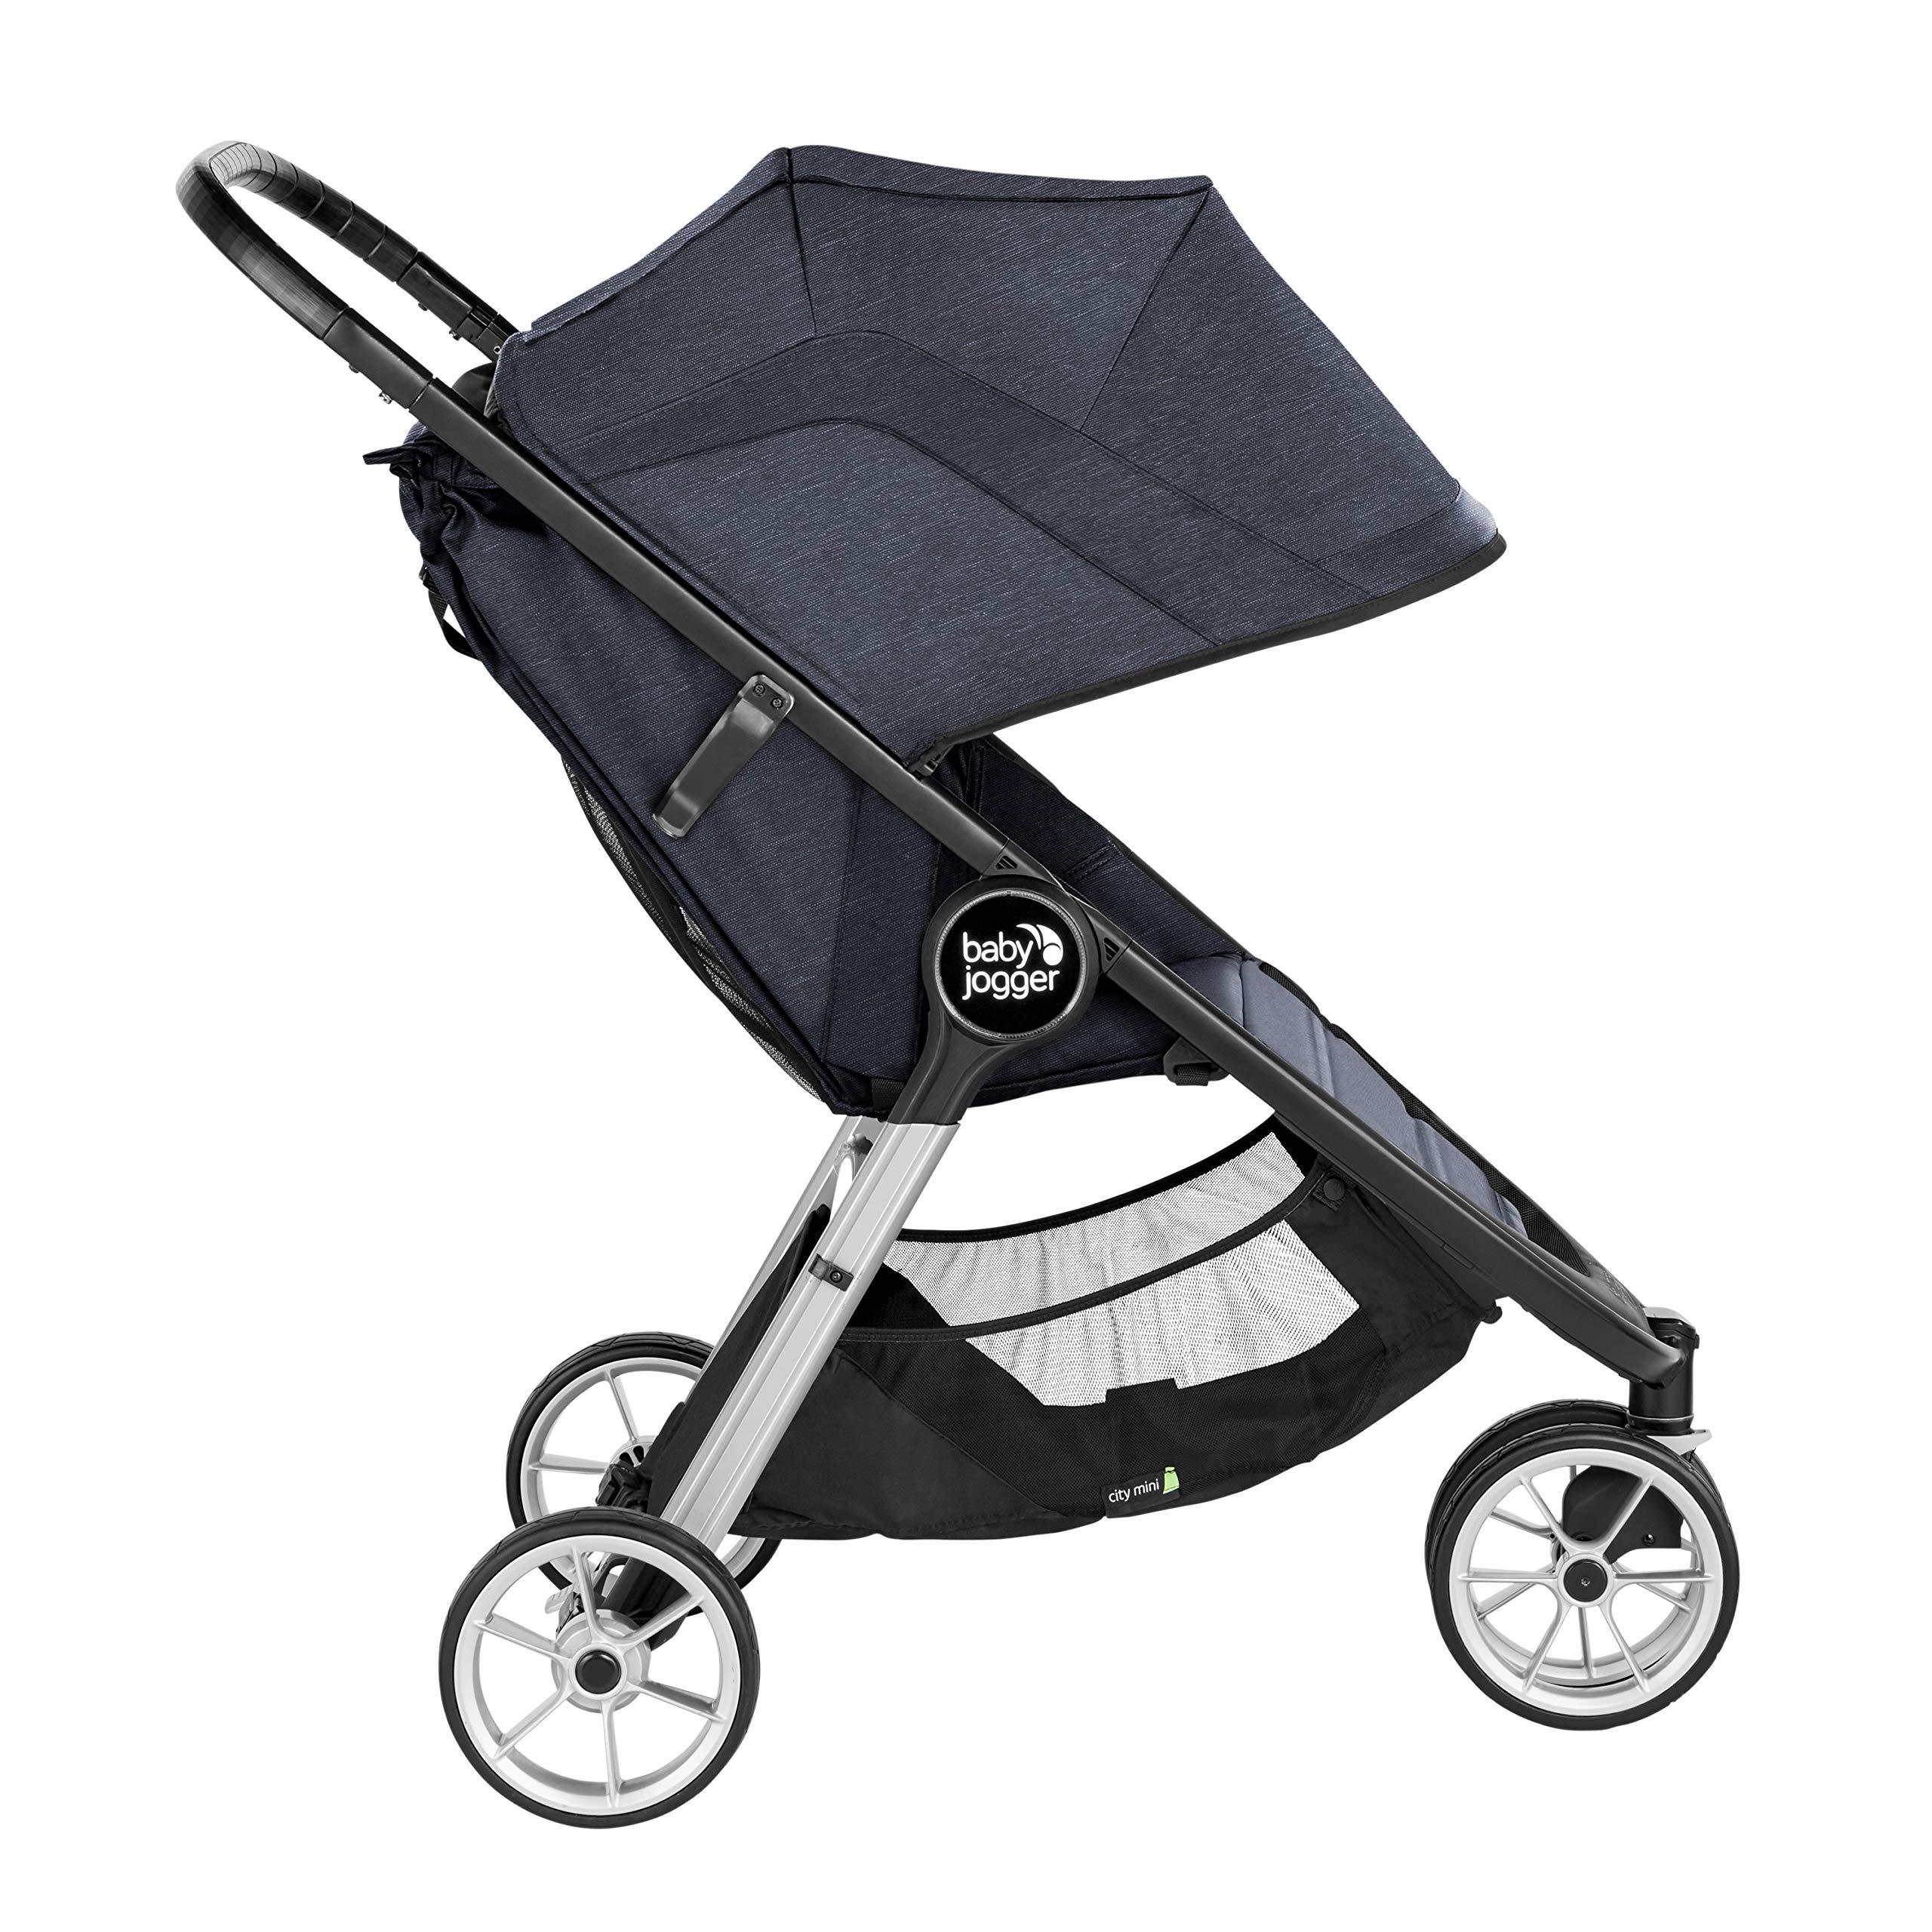 Baby Jogger City Mini 2 Stroller - 2019   Compact, Lightweight Stroller   Quick Fold Baby Stroller, Carbon by Baby Jogger (Image #13)